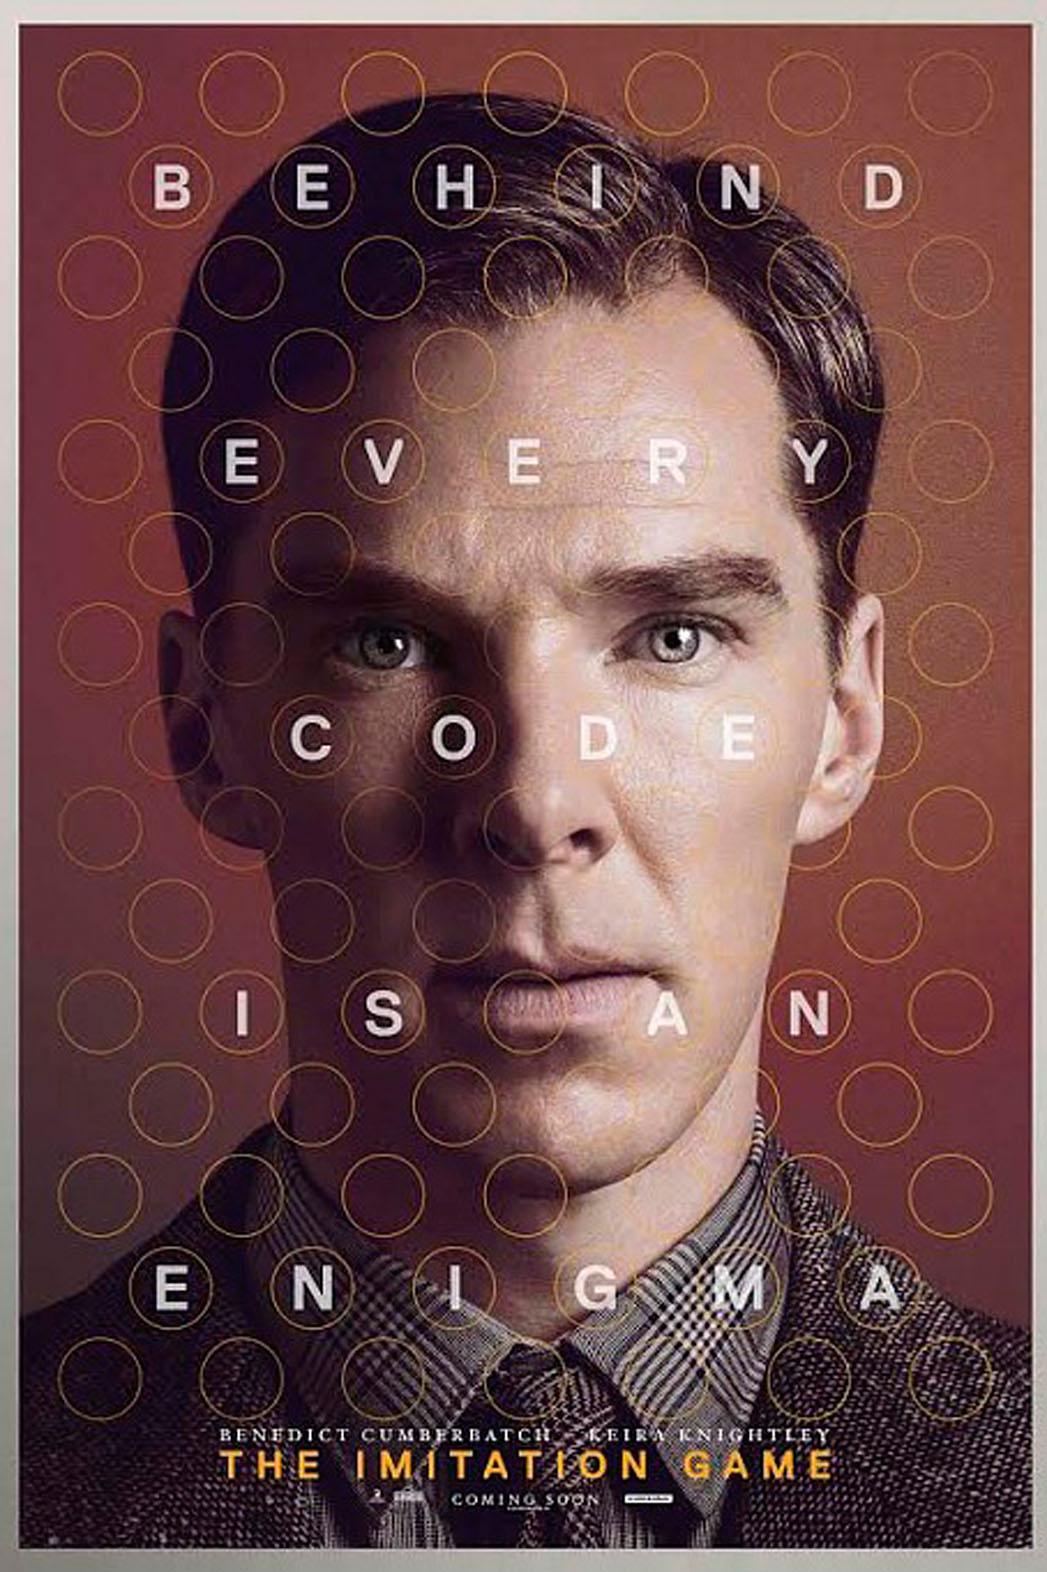 the-imitation-game-movie-poster.jpg